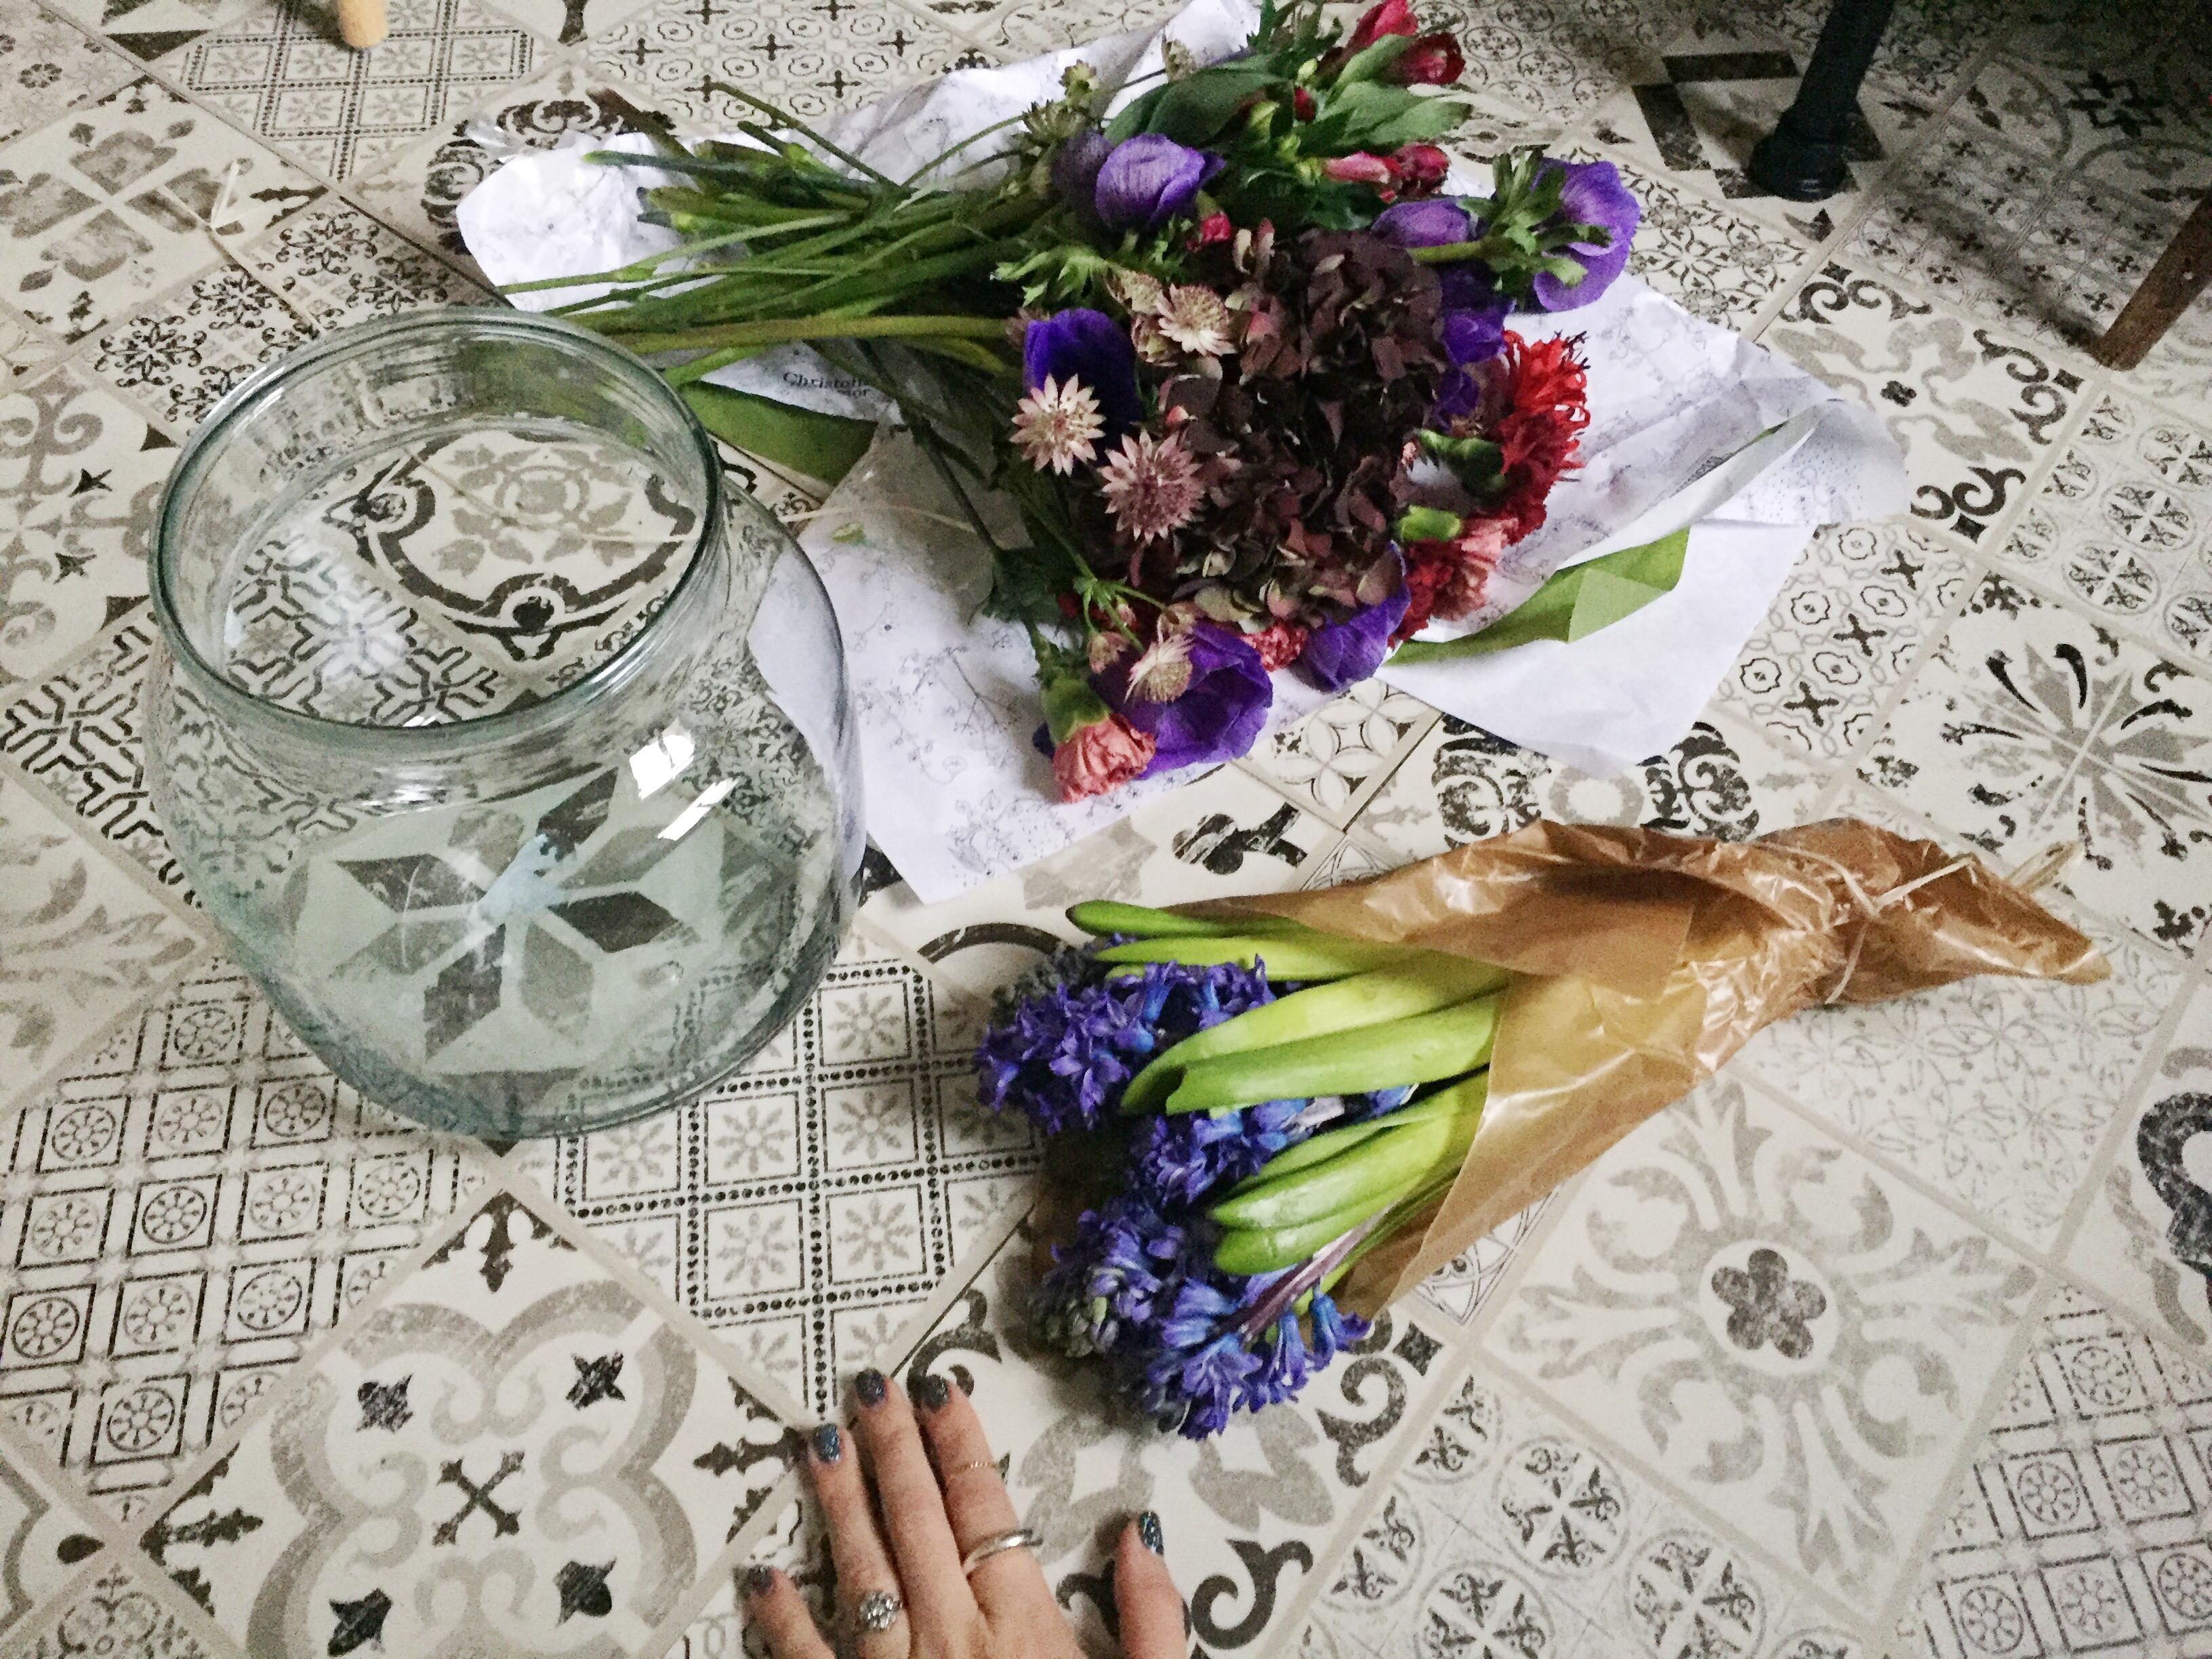 Amelia Widell en inredningsblogg – Metro Mode